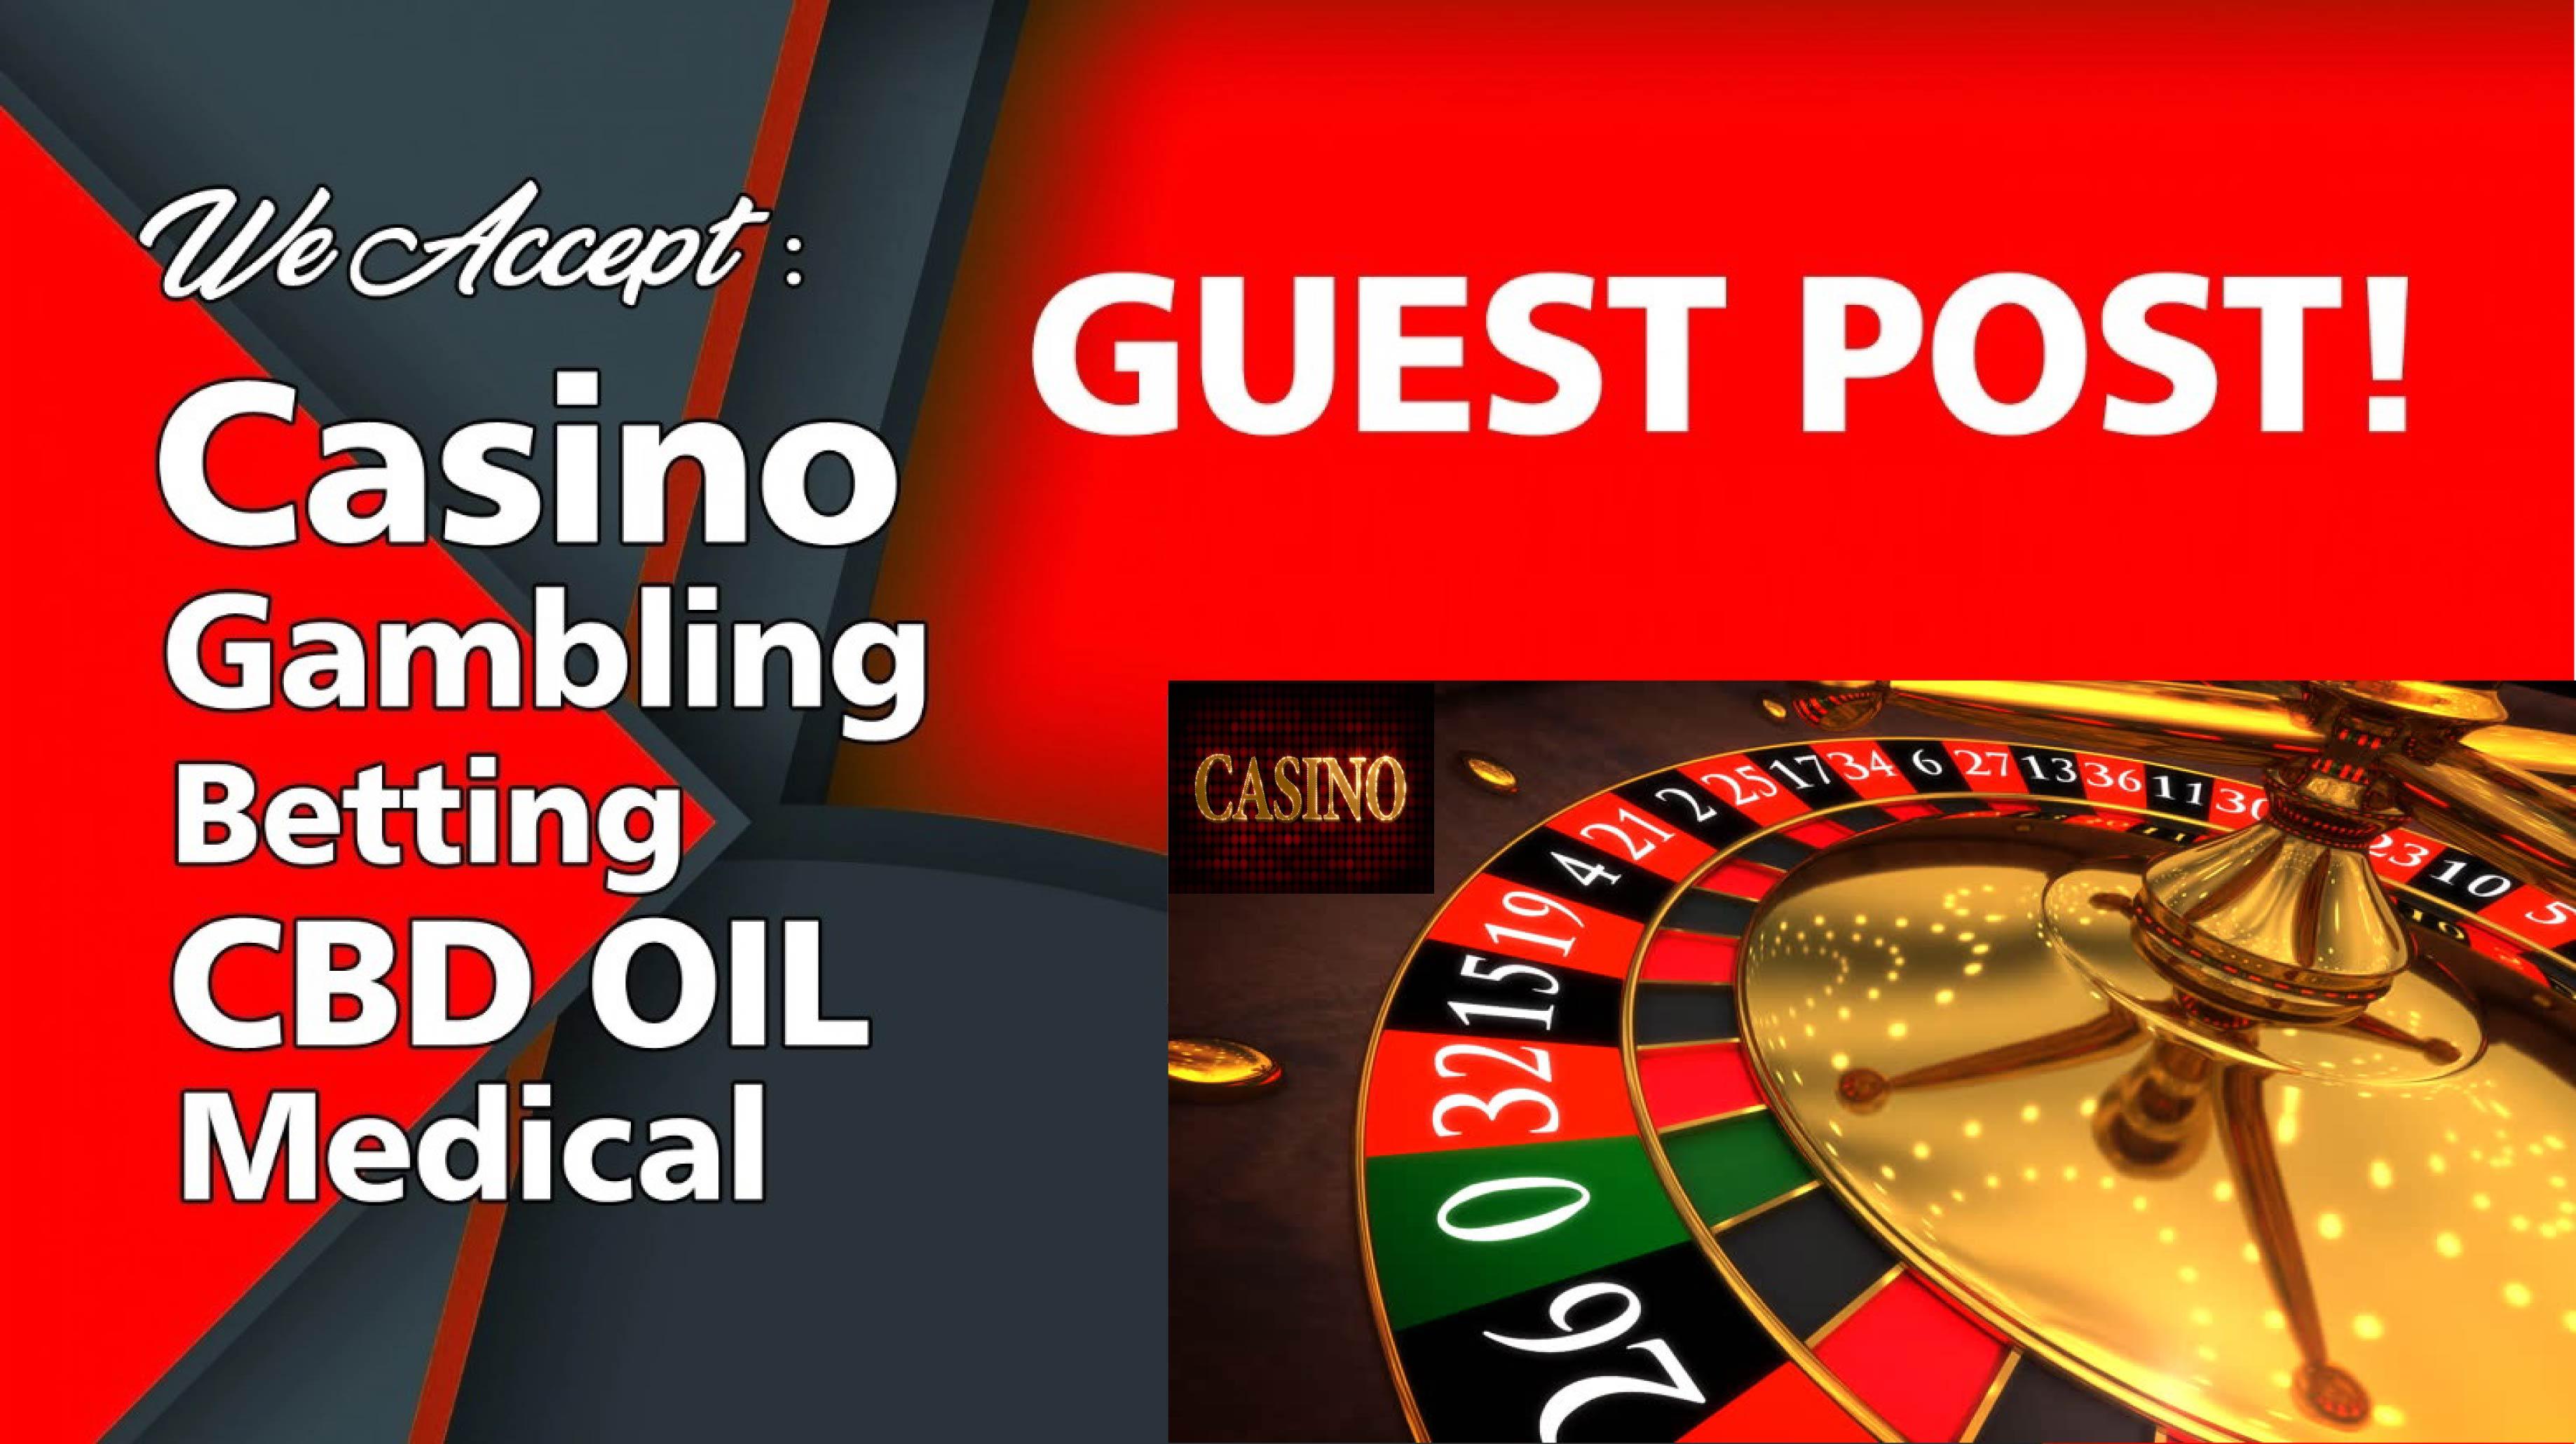 Casino Guest Post for Gambling Poker Sports Betting Online Casino Niche Site